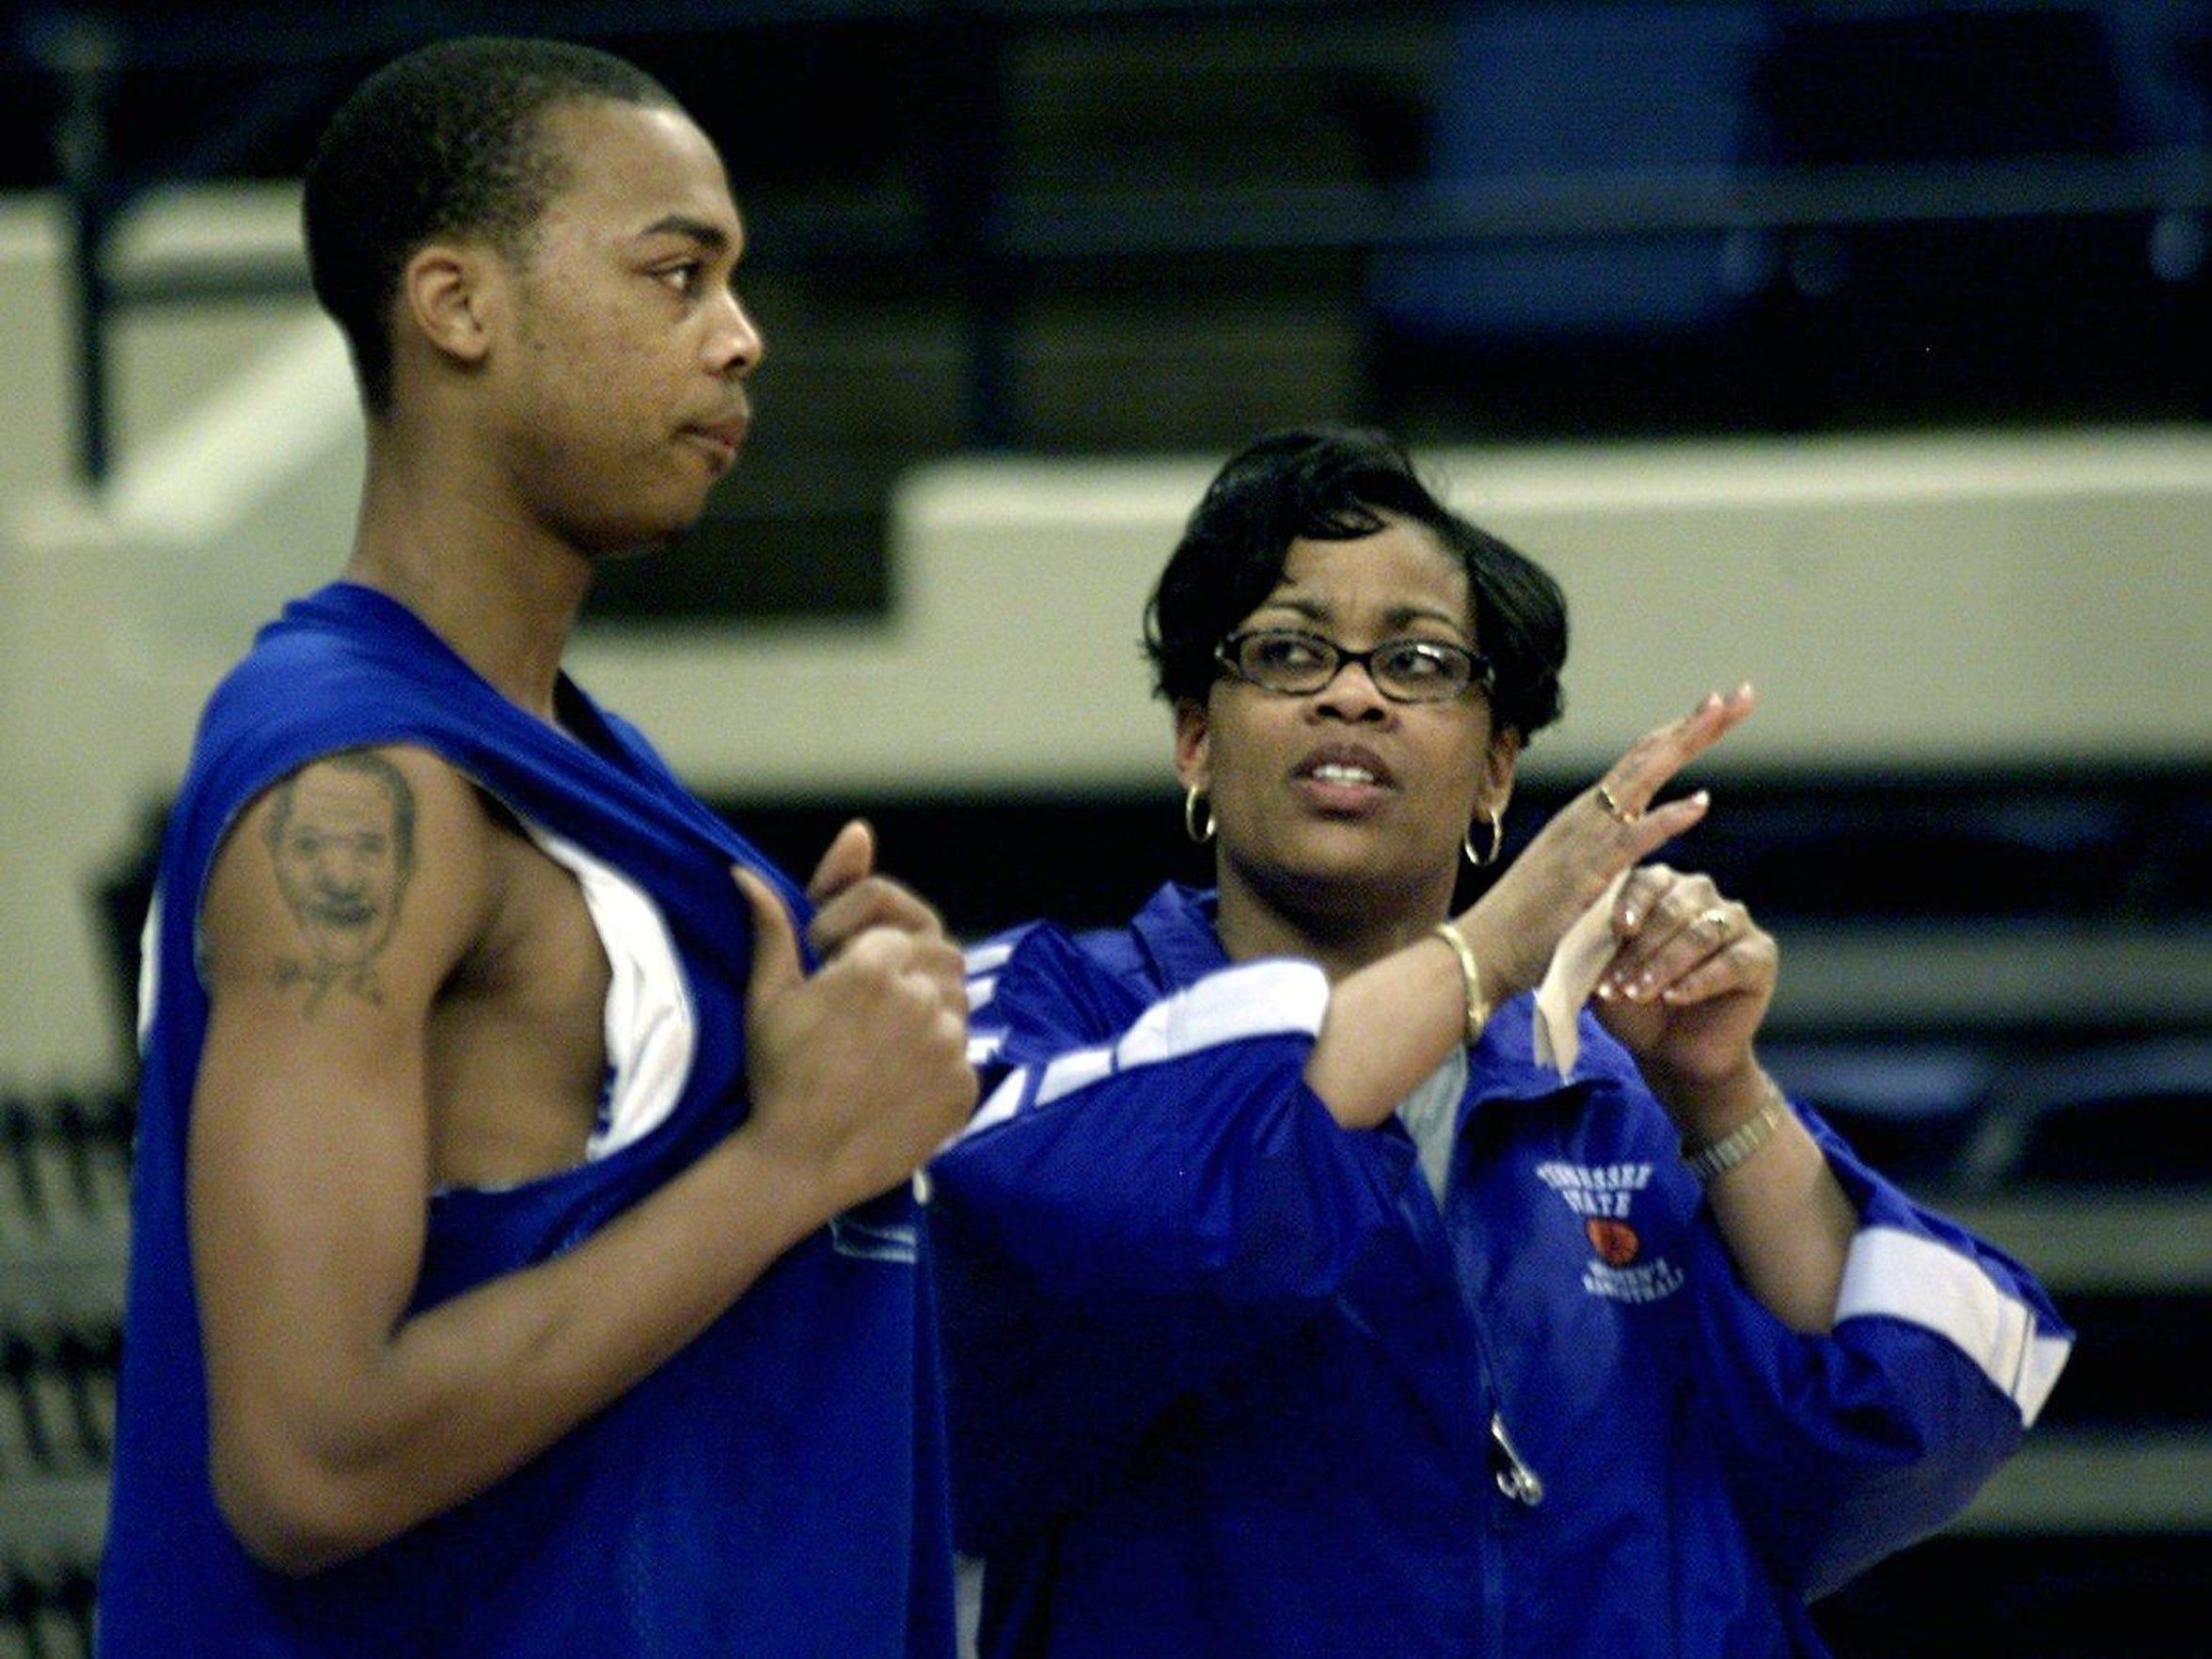 Teresa Phillips coaching men